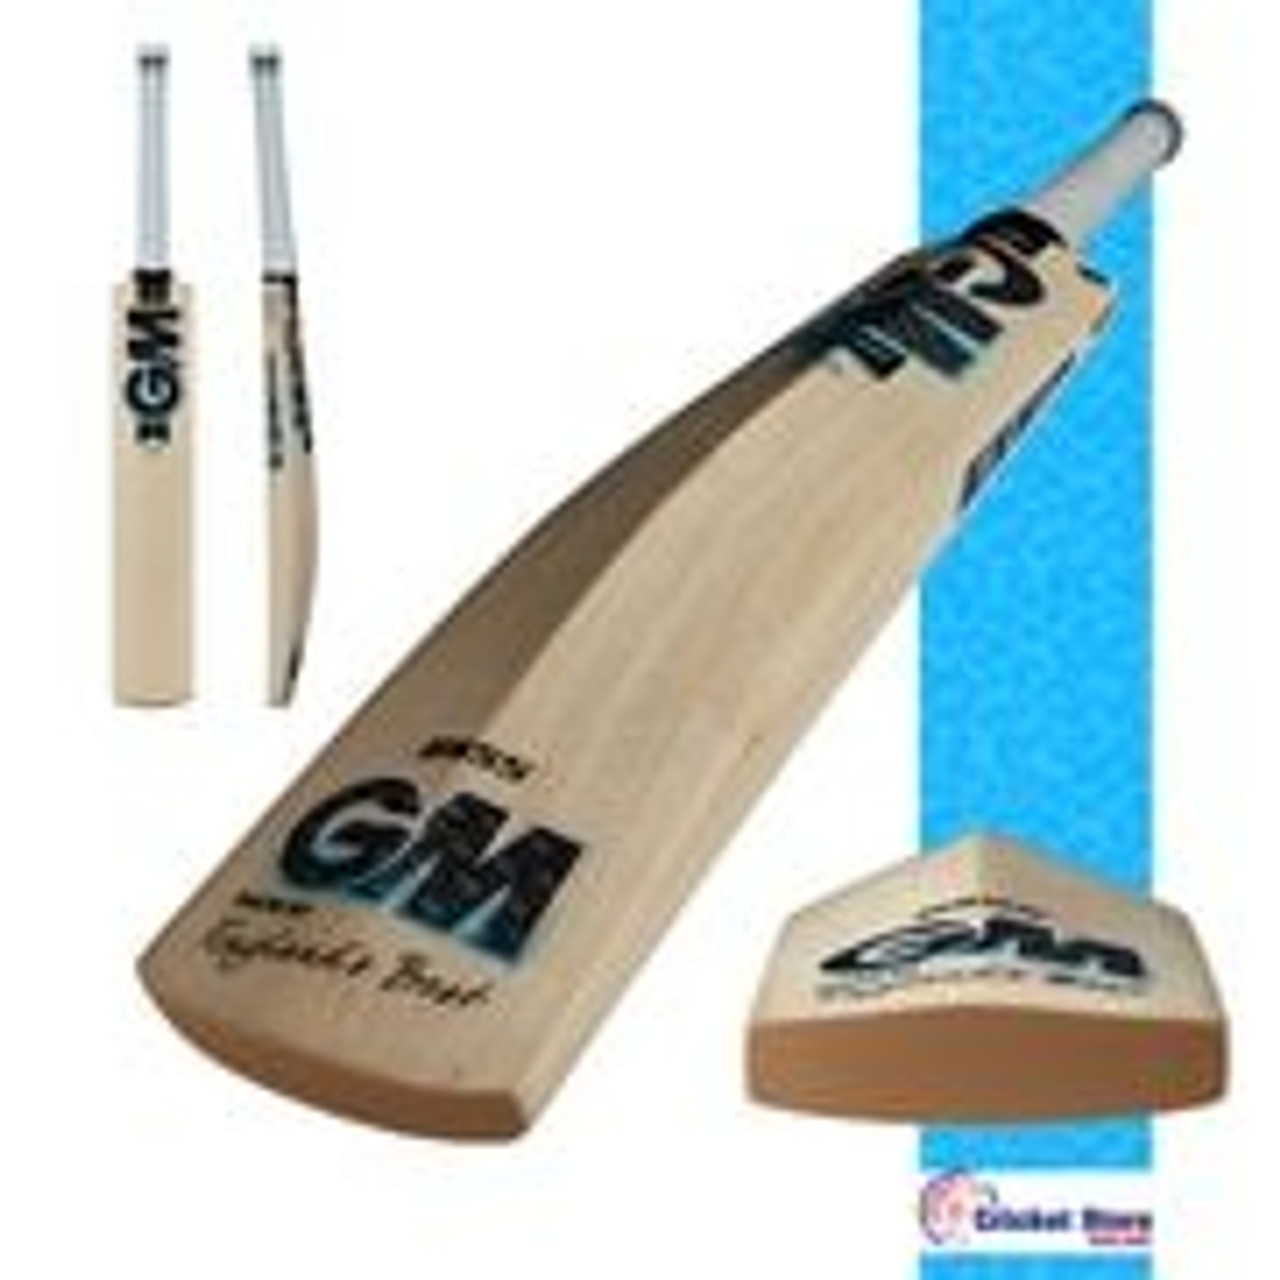 GM Diamond Cricket Bats 2019